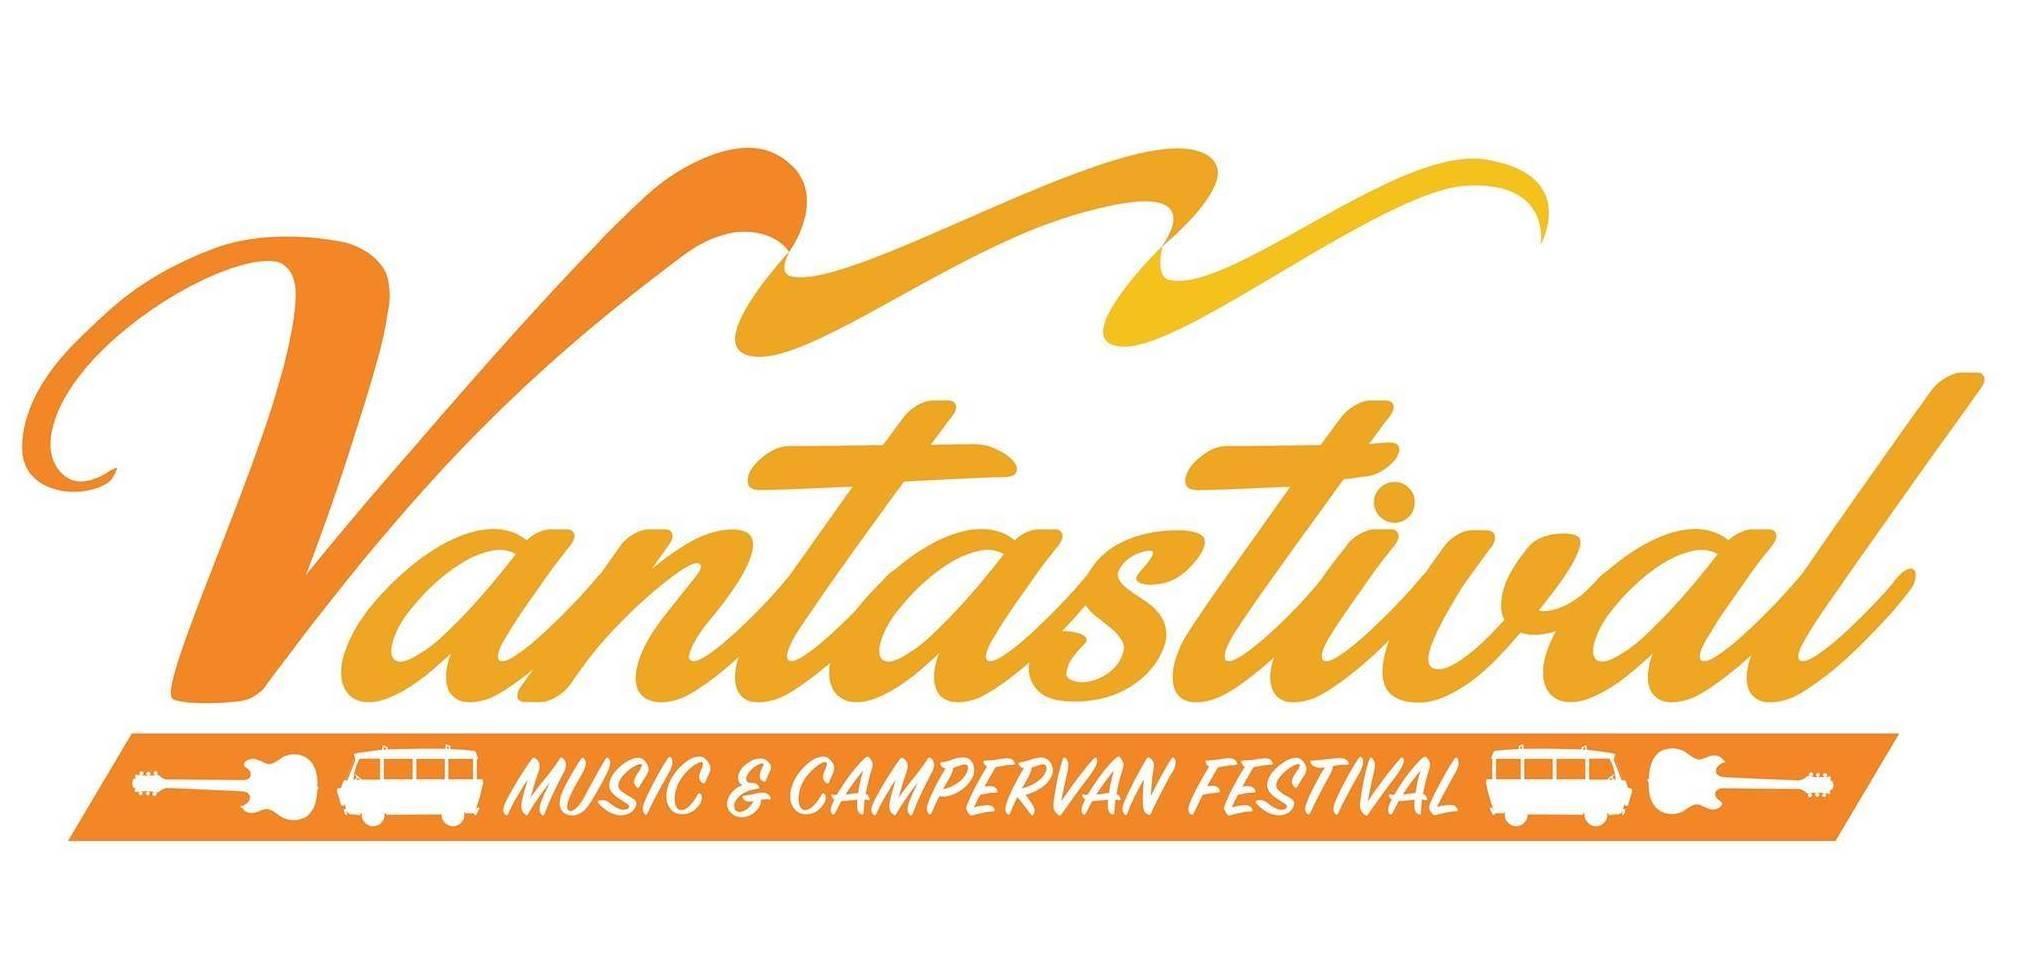 Vantastical Music and Campervan Festival in Ireland